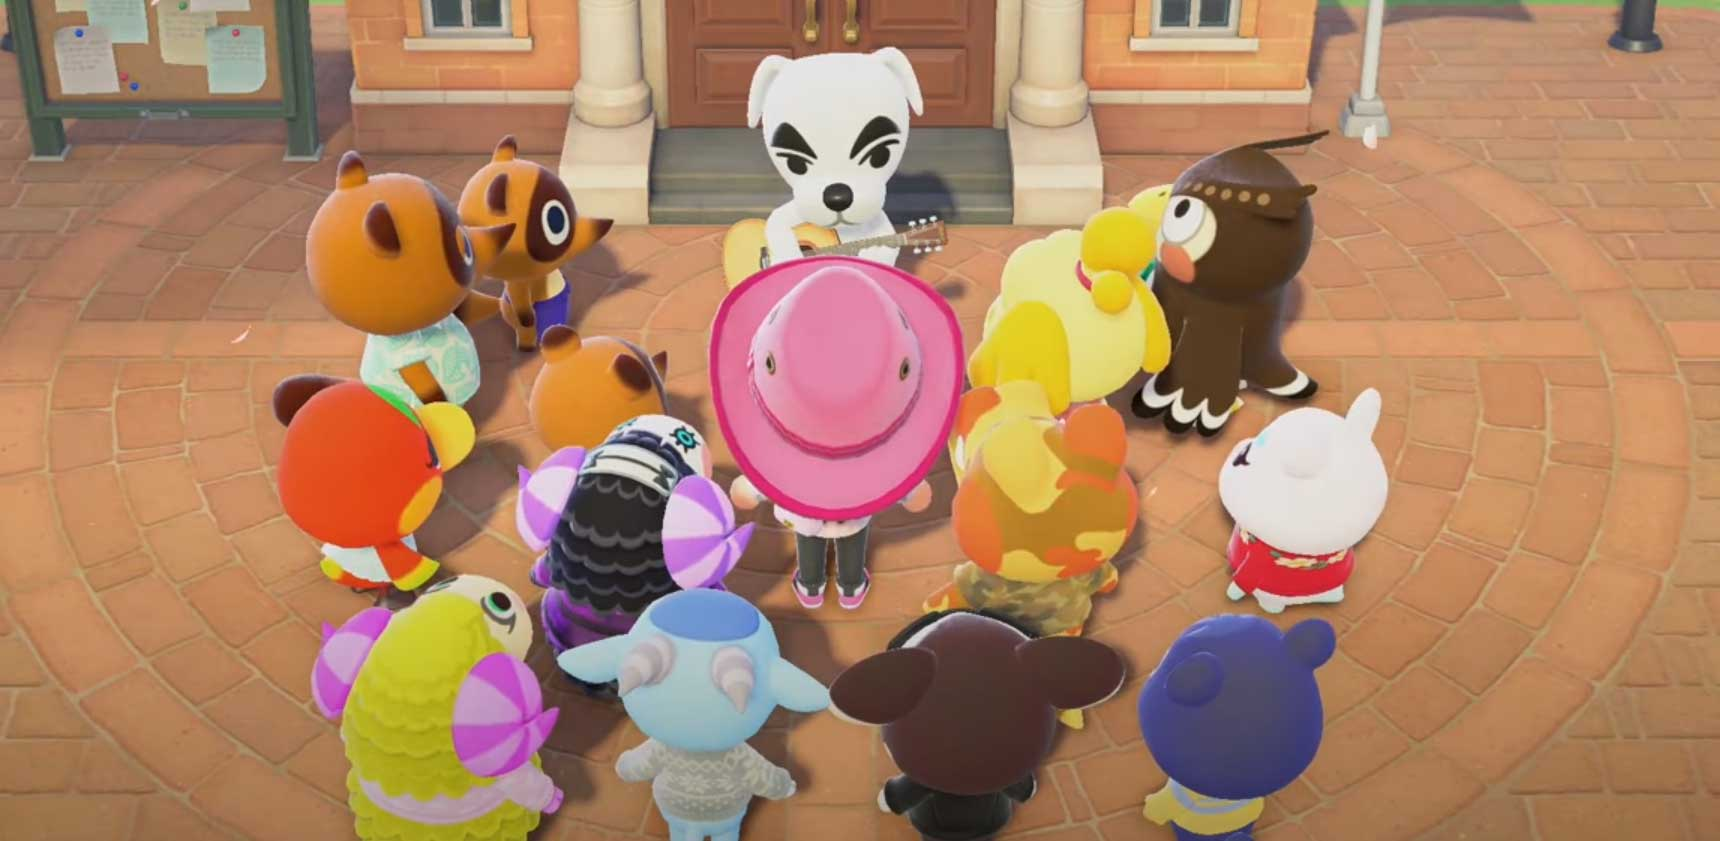 How to find KK Slider in Animal Crossing: New Horizons